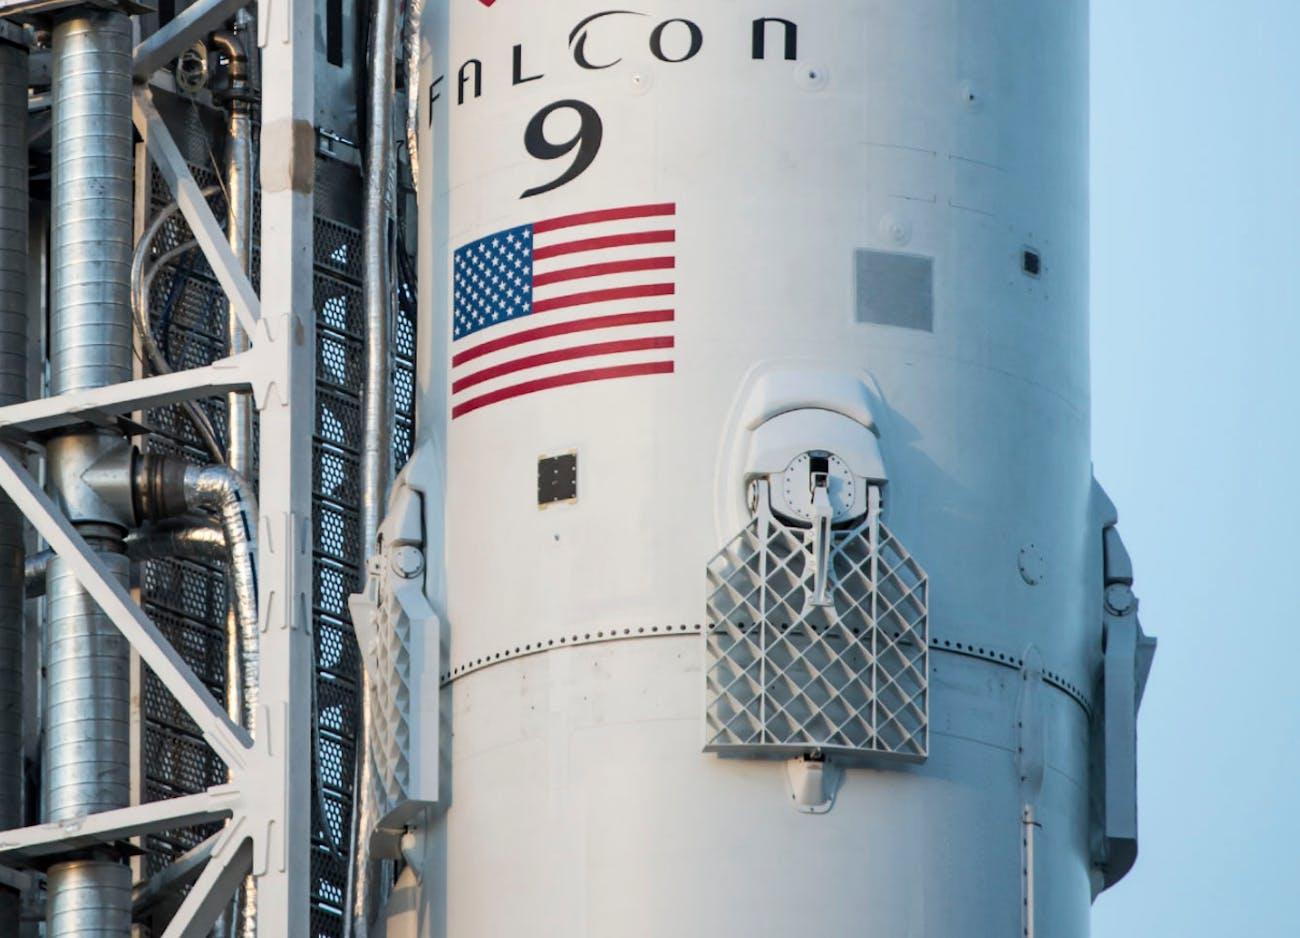 A SpaceX Falcon 9 grid fin.